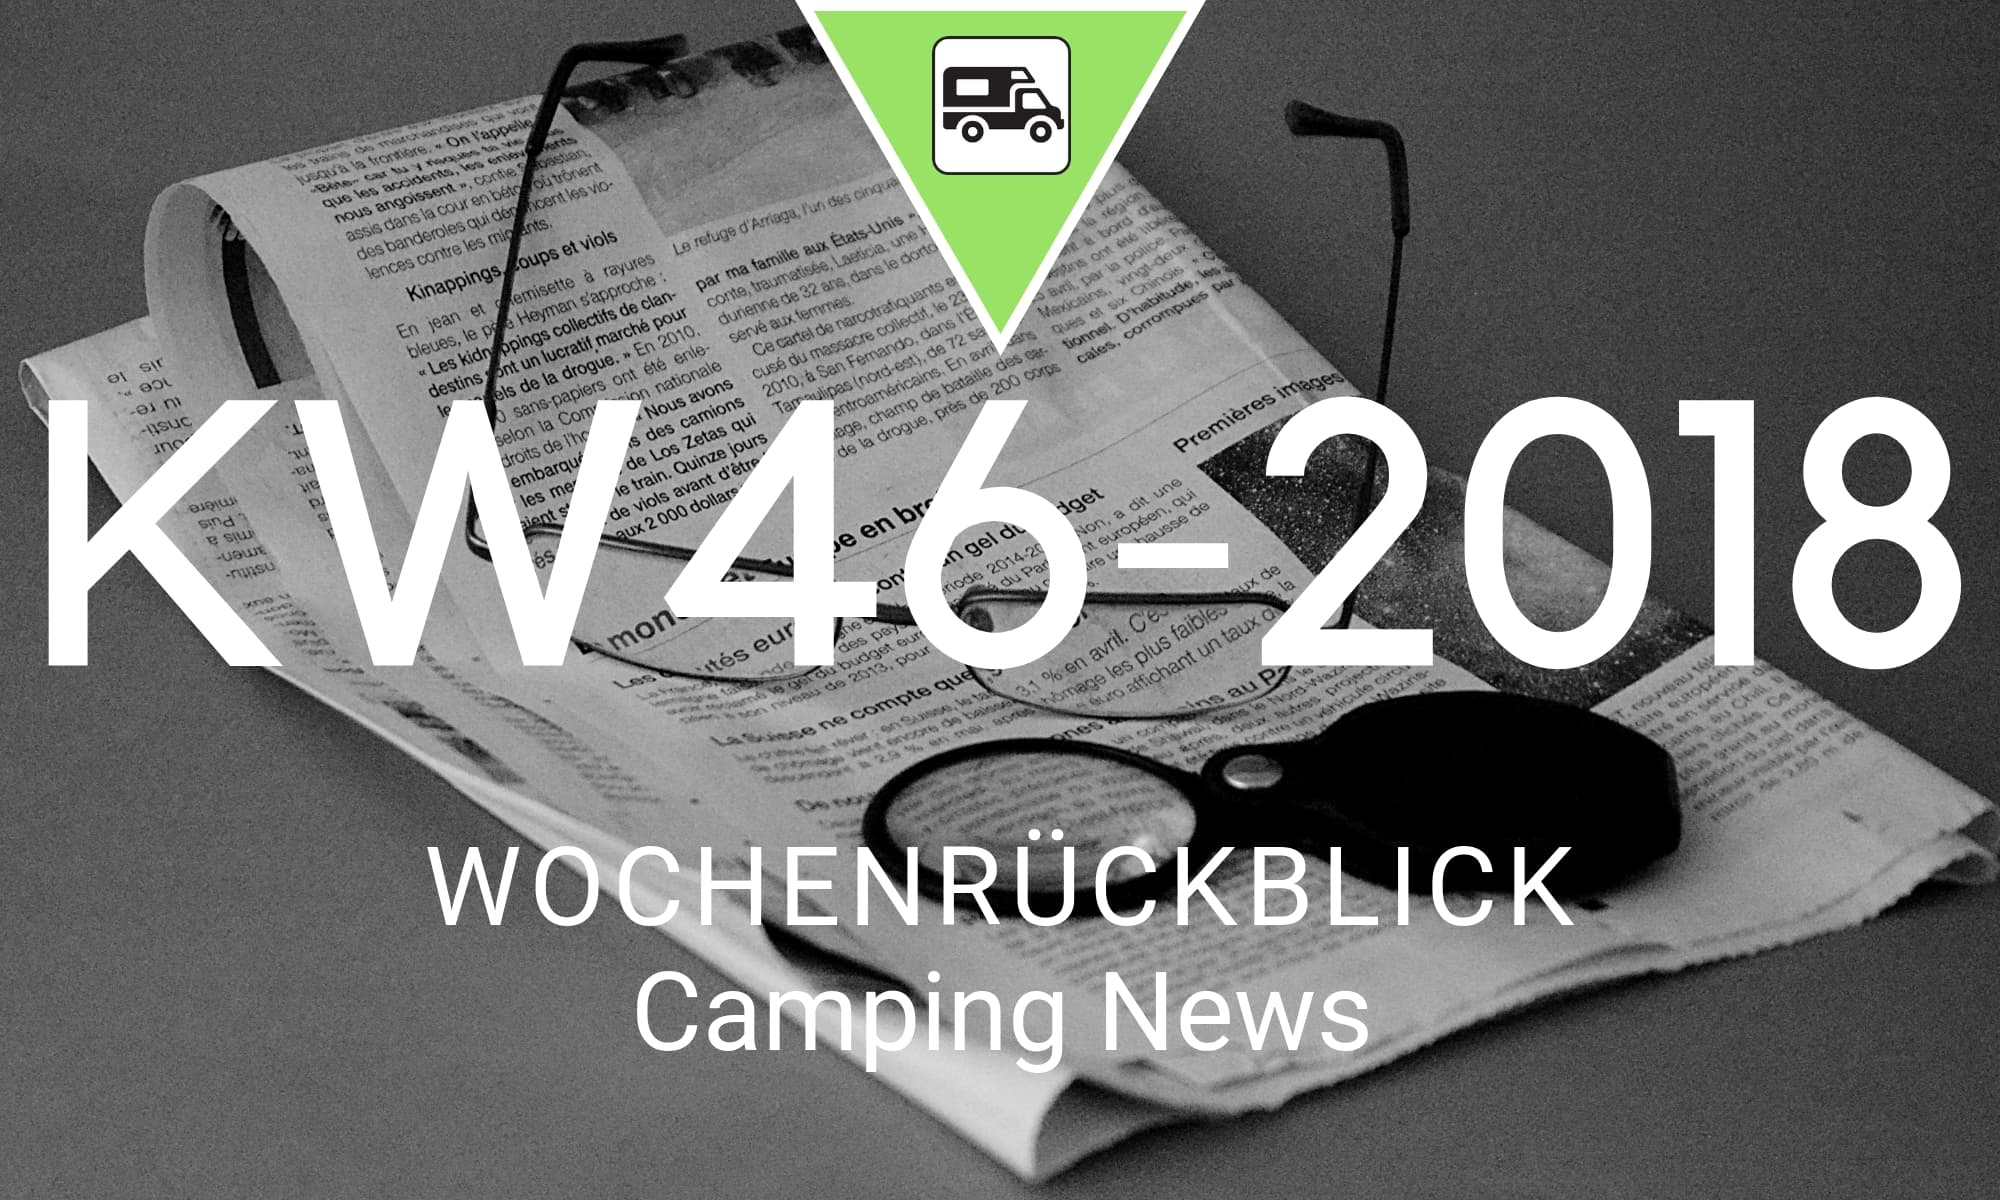 Wochenrückblick Camping News KW46-2018